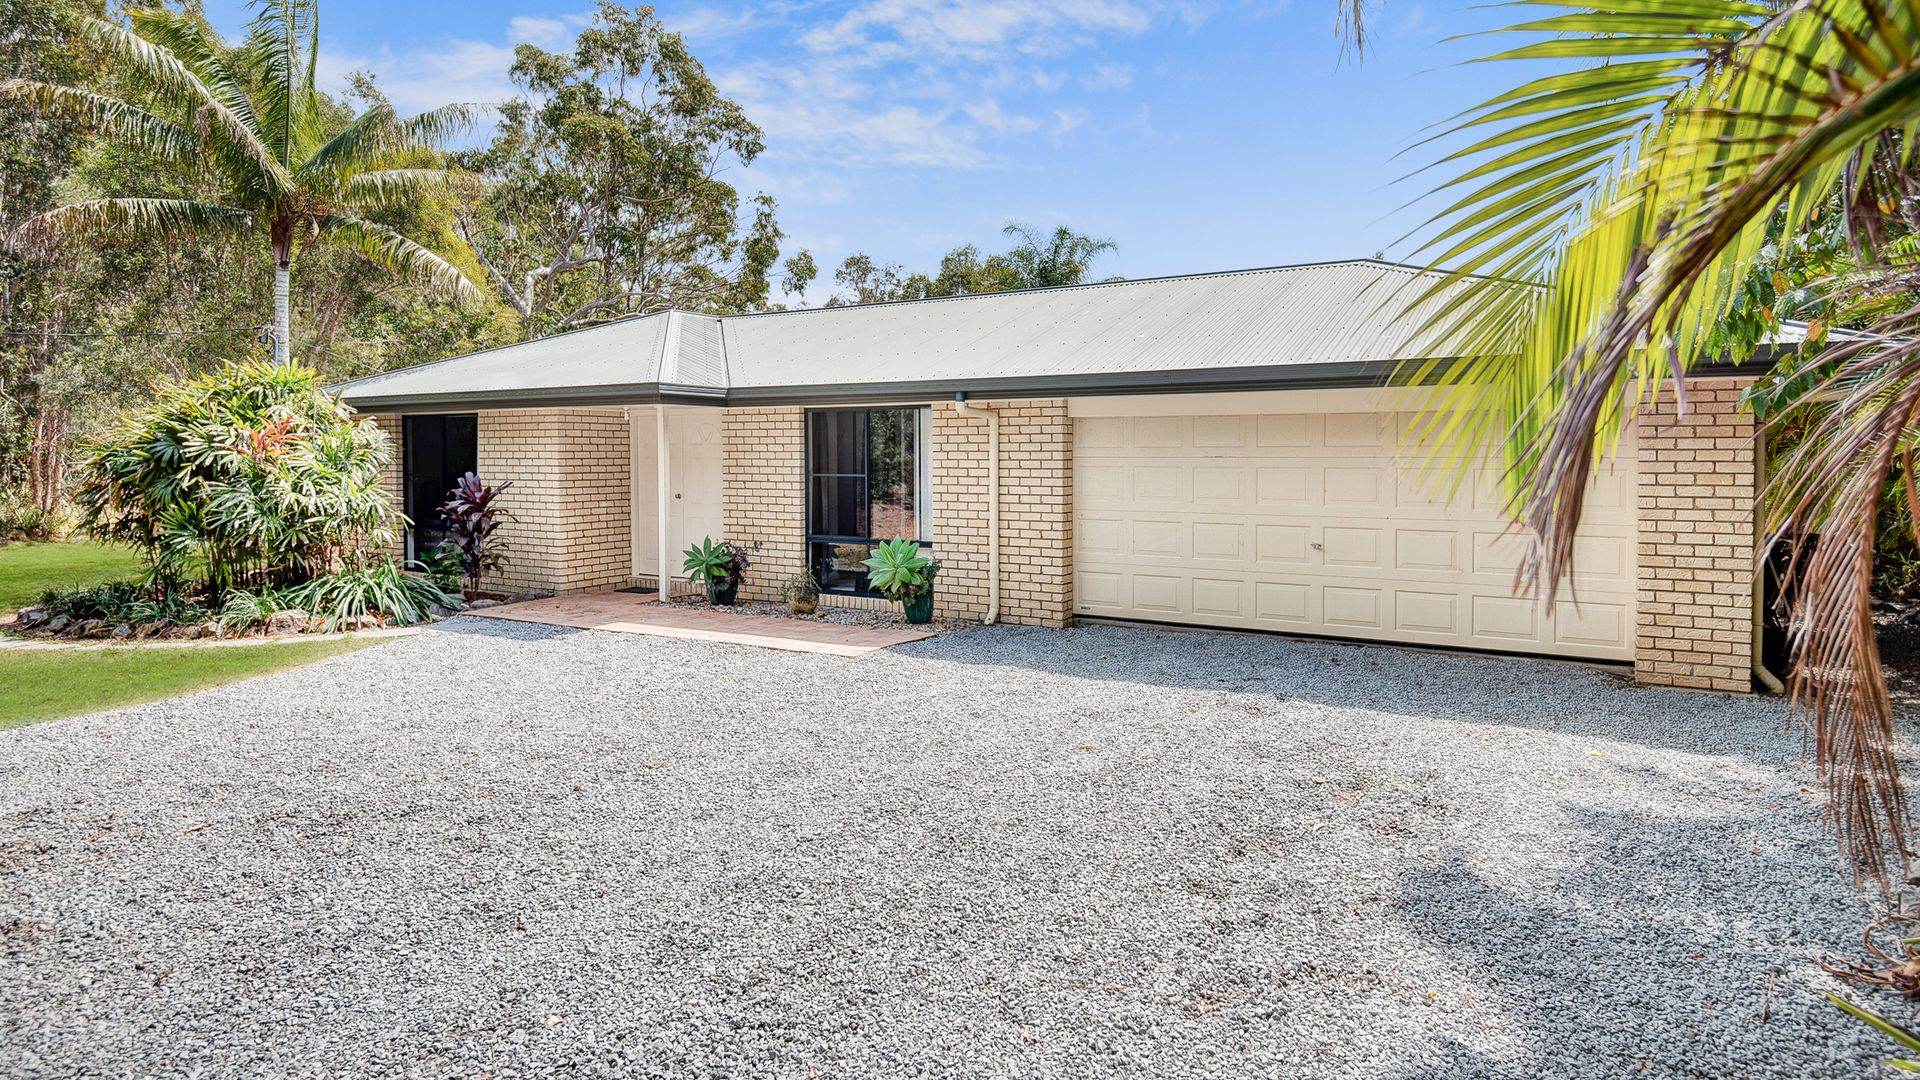 51 Paradise Drive, Weyba Downs QLD 4562, Image 1